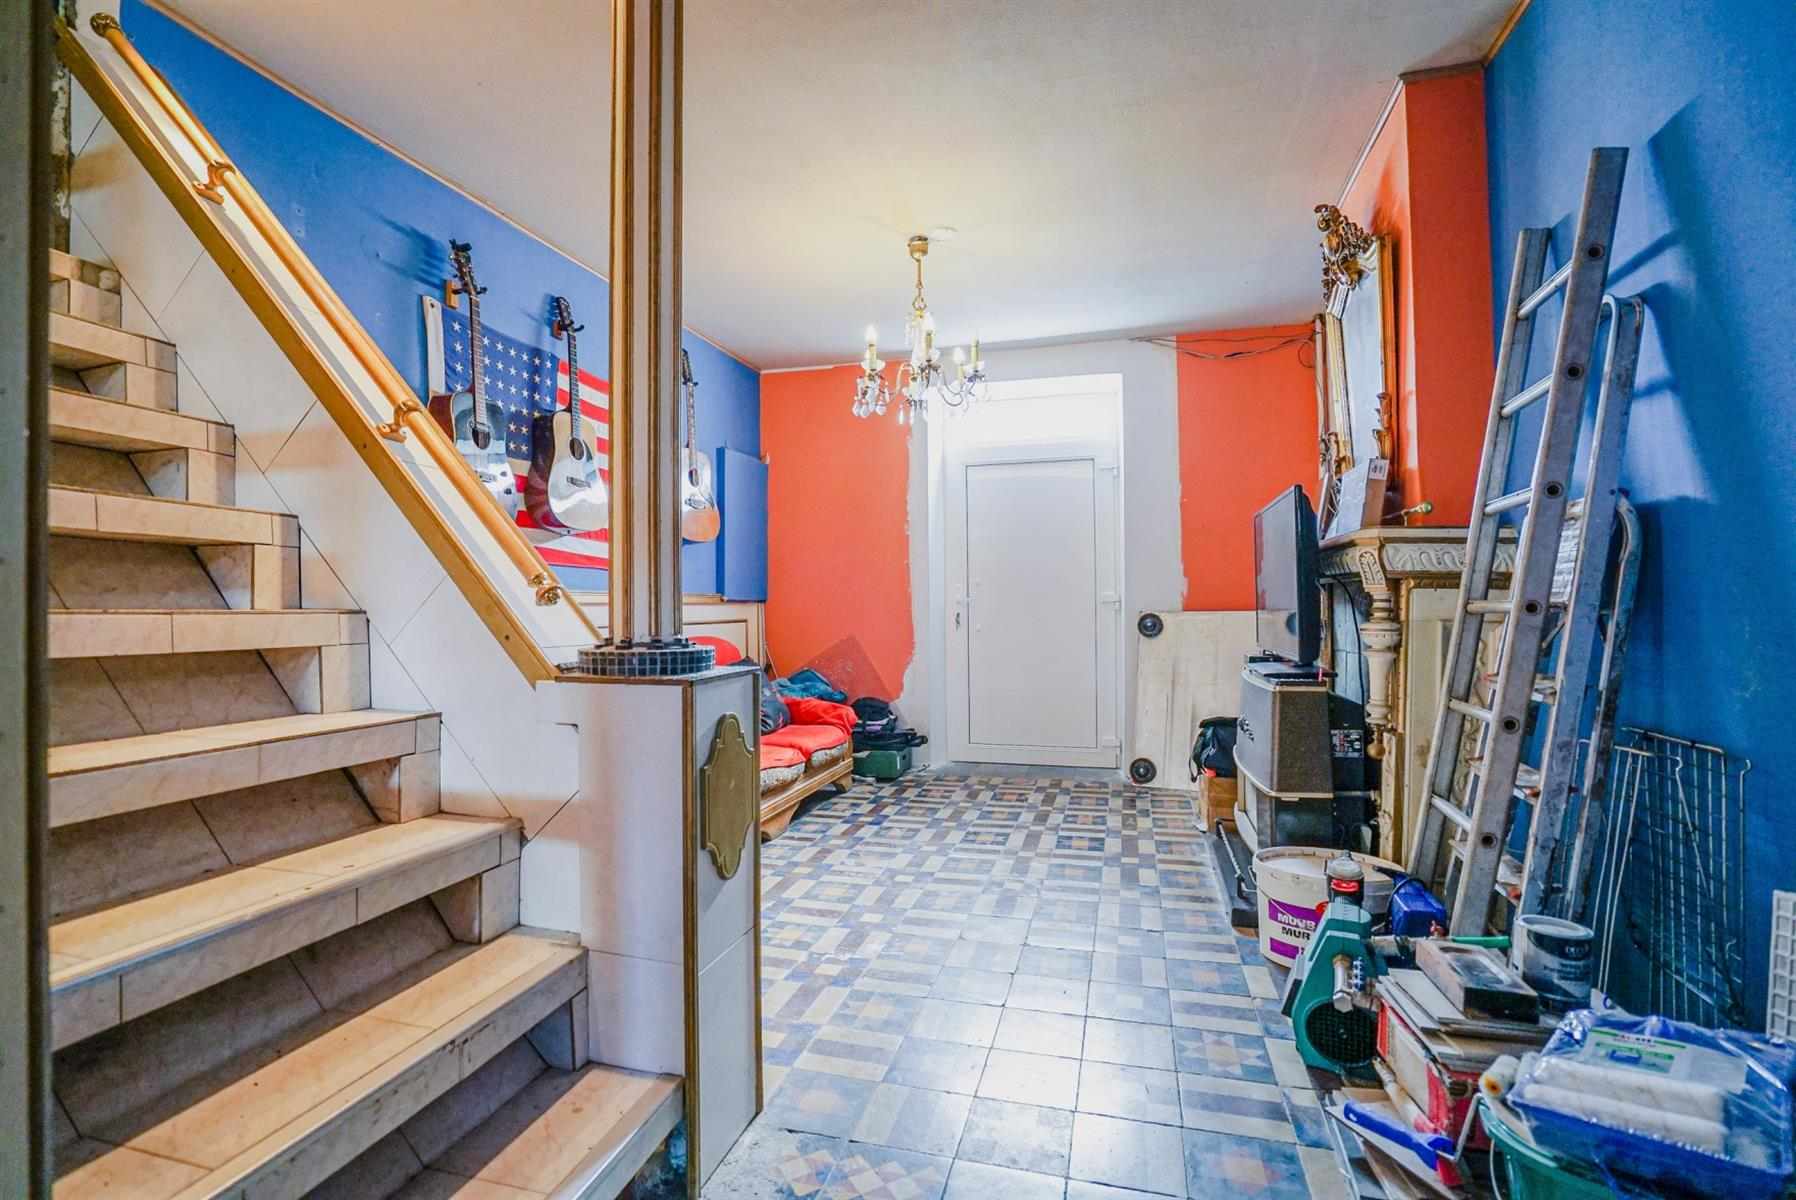 Maison - Oupeye Hermallesous-Argenteau - #4324098-1